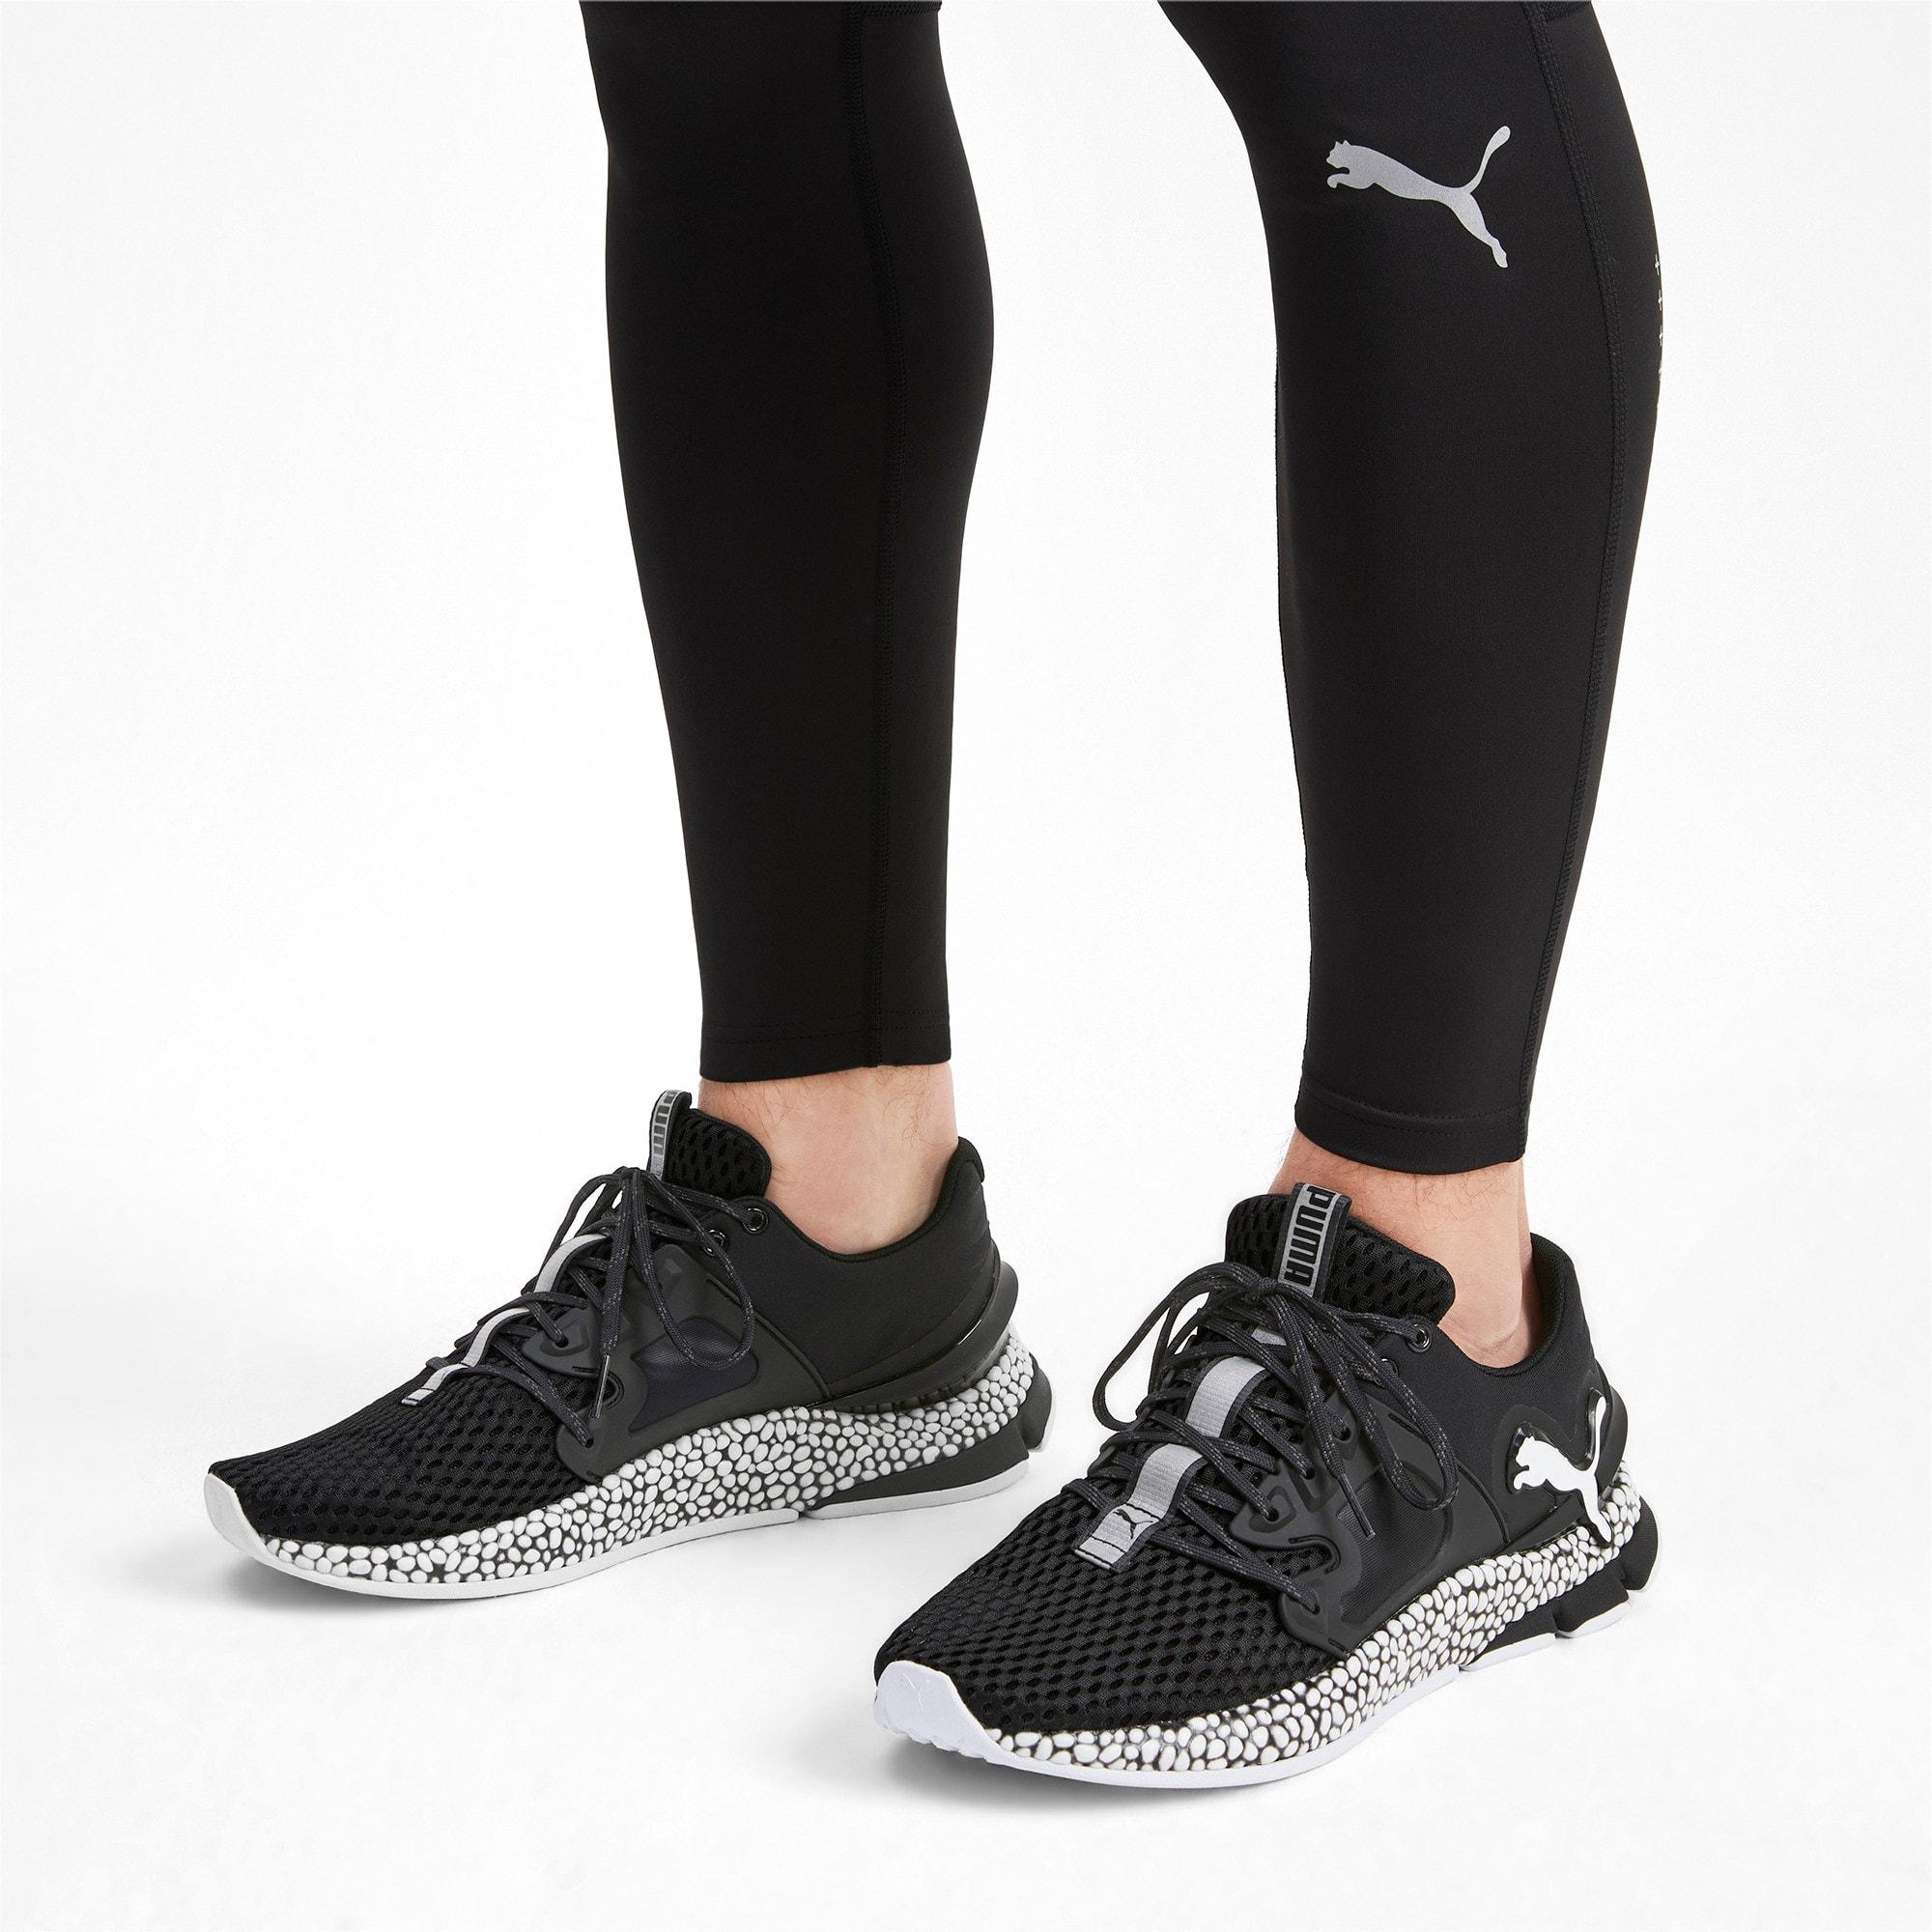 Thumbnail 2 of HYBRID Sky Men's Running Shoes, Puma Black-Puma White, medium